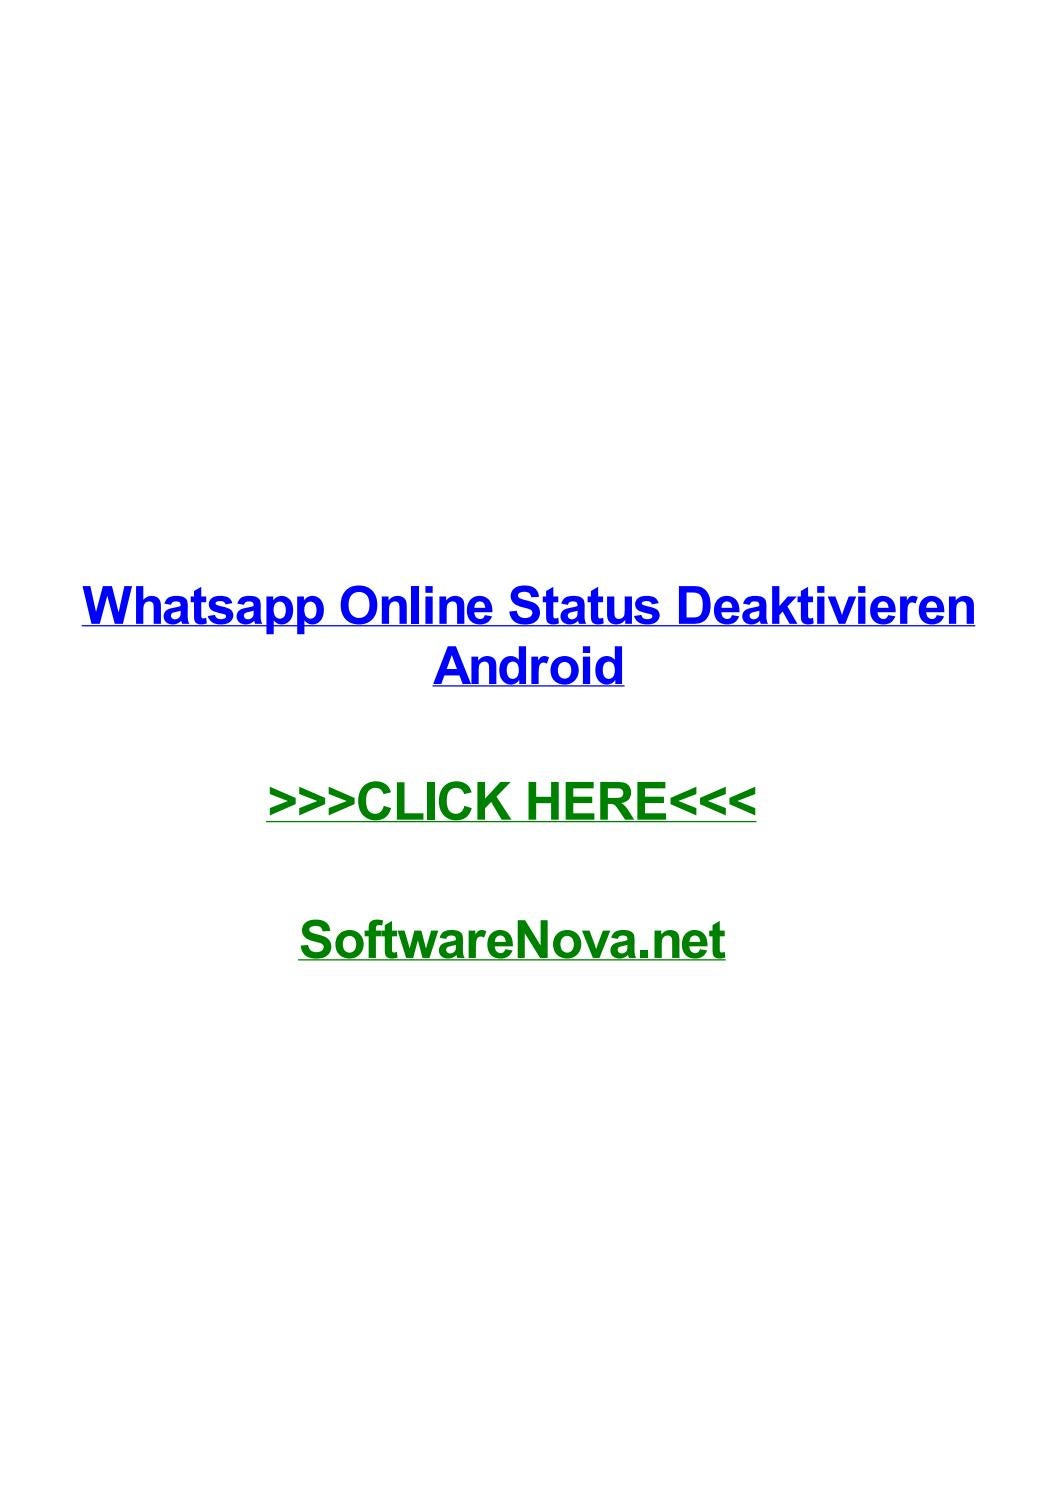 Whatsapp Online Status Deaktivieren Android By Michaelaaasr